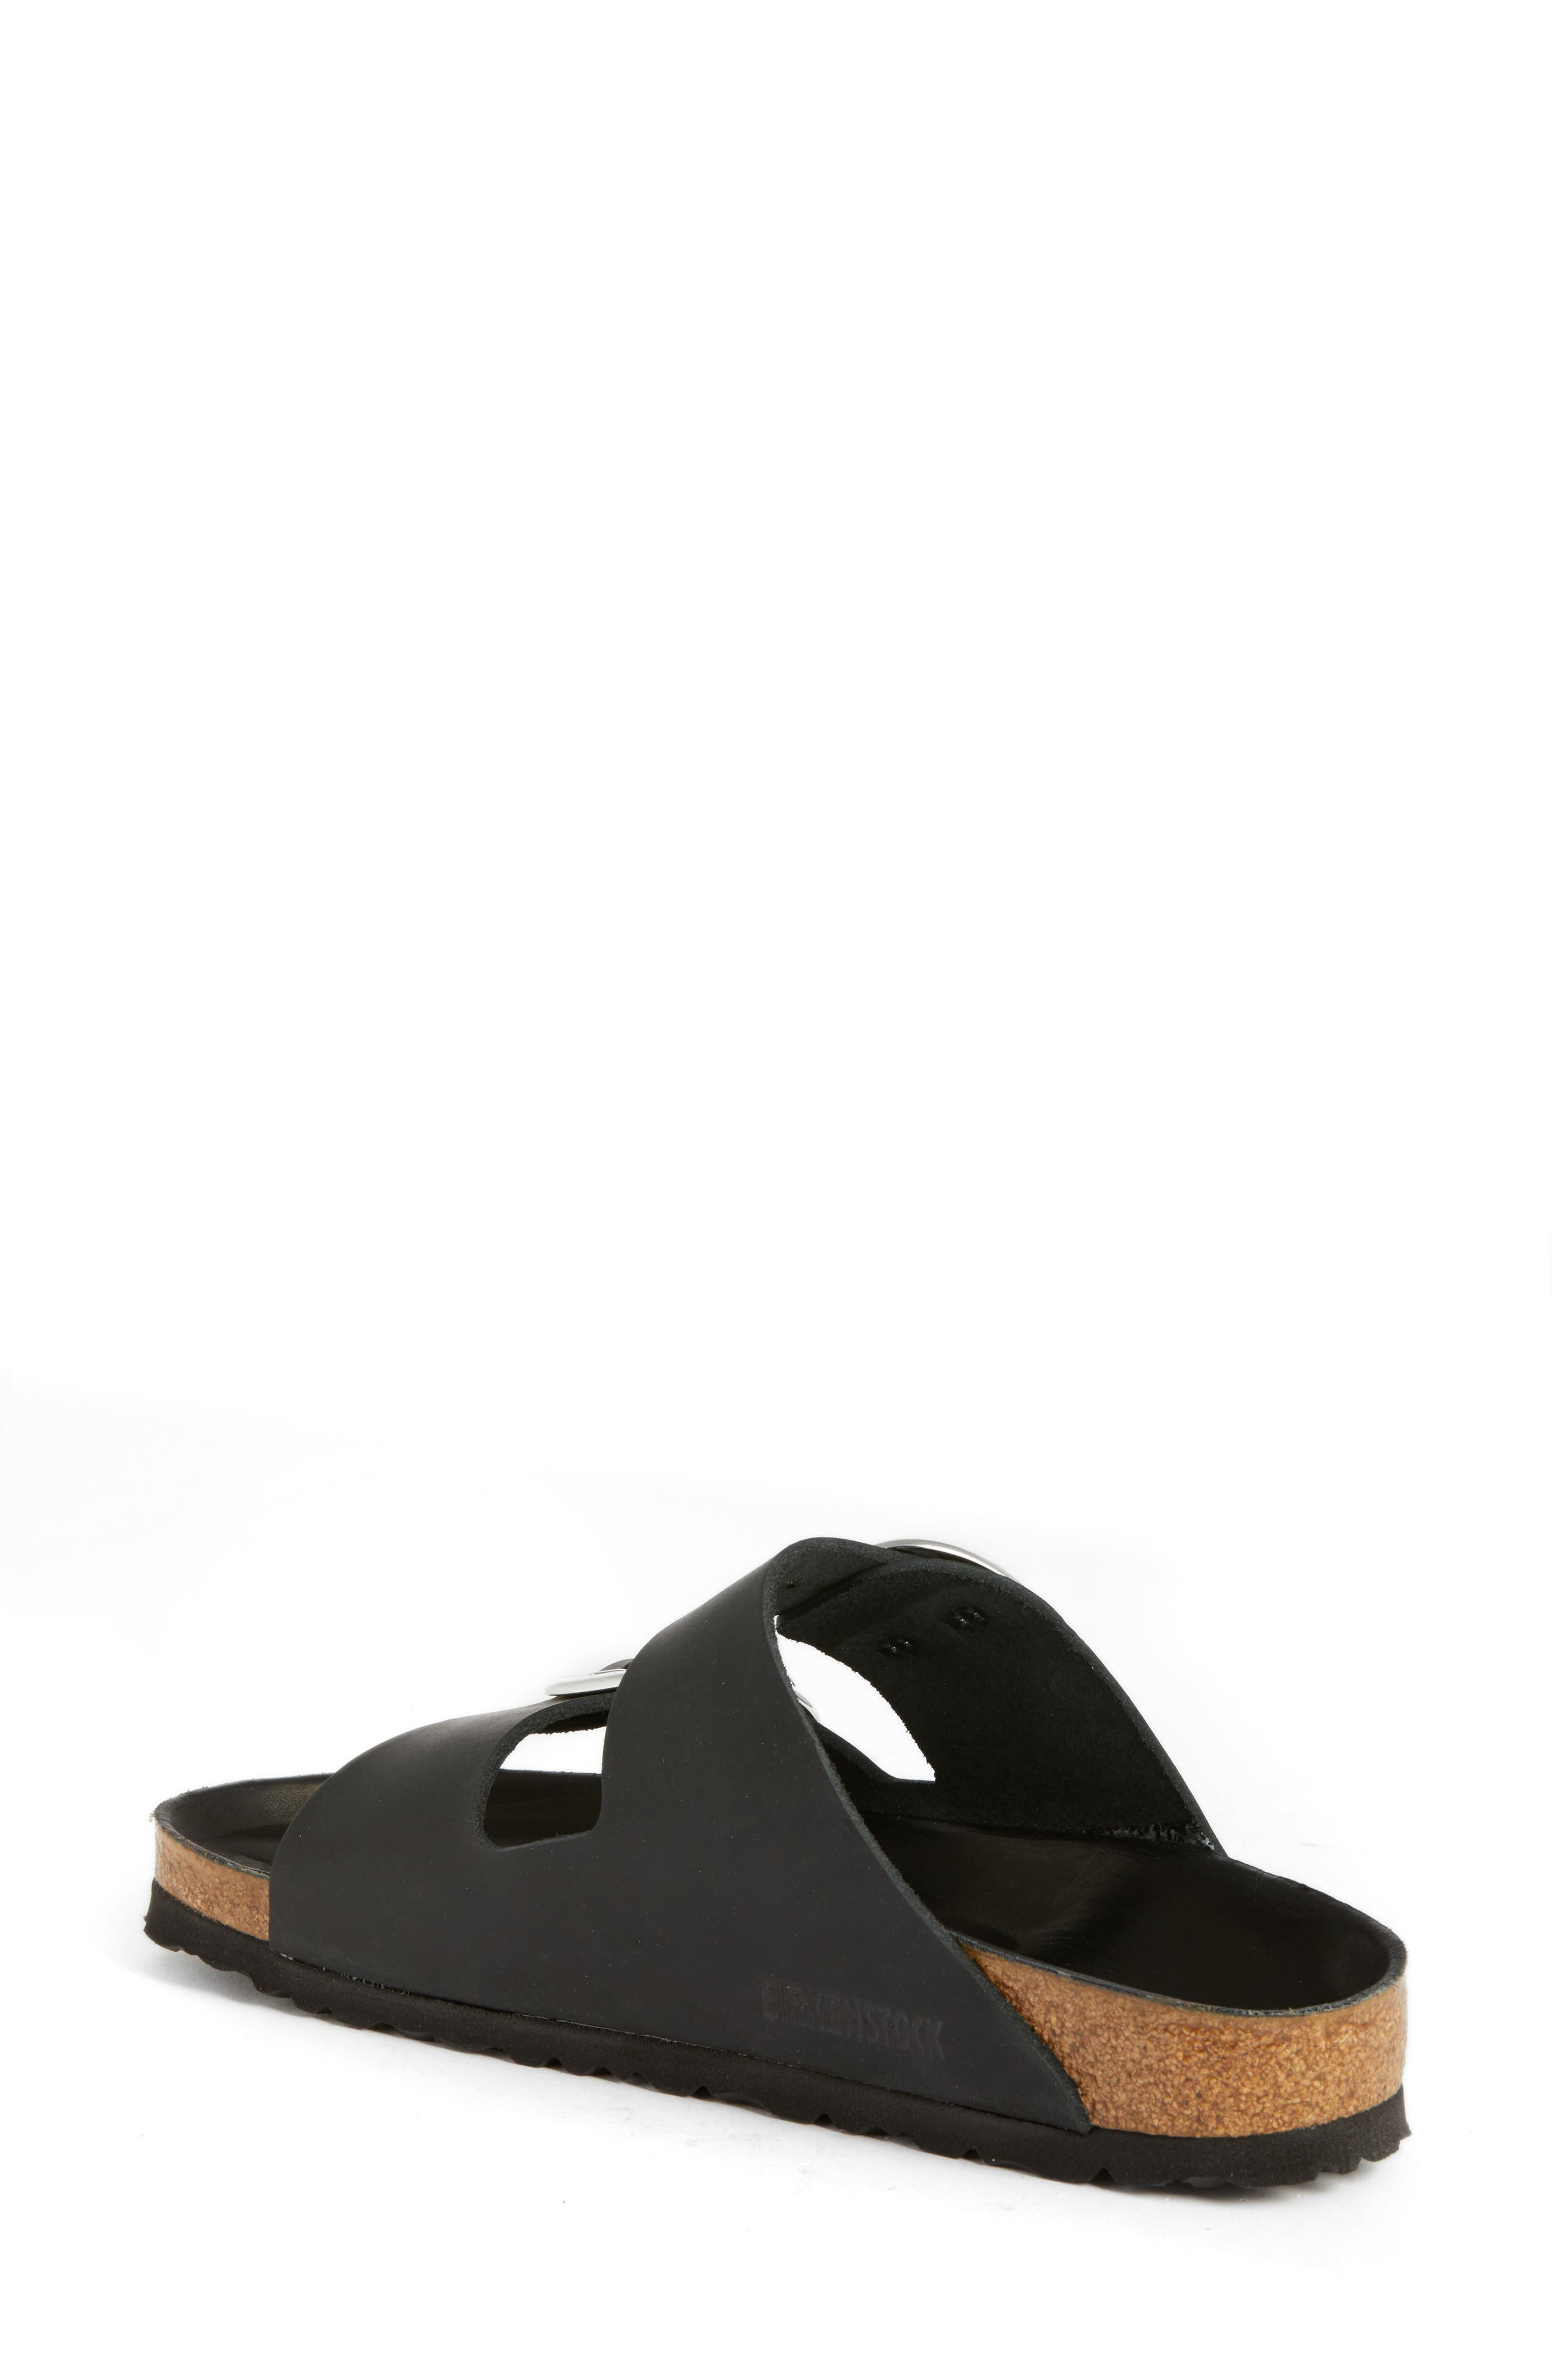 Arizona Big Buckle Slide Sandal,                             Alternate thumbnail 2, color,                             BLACK LEATHER